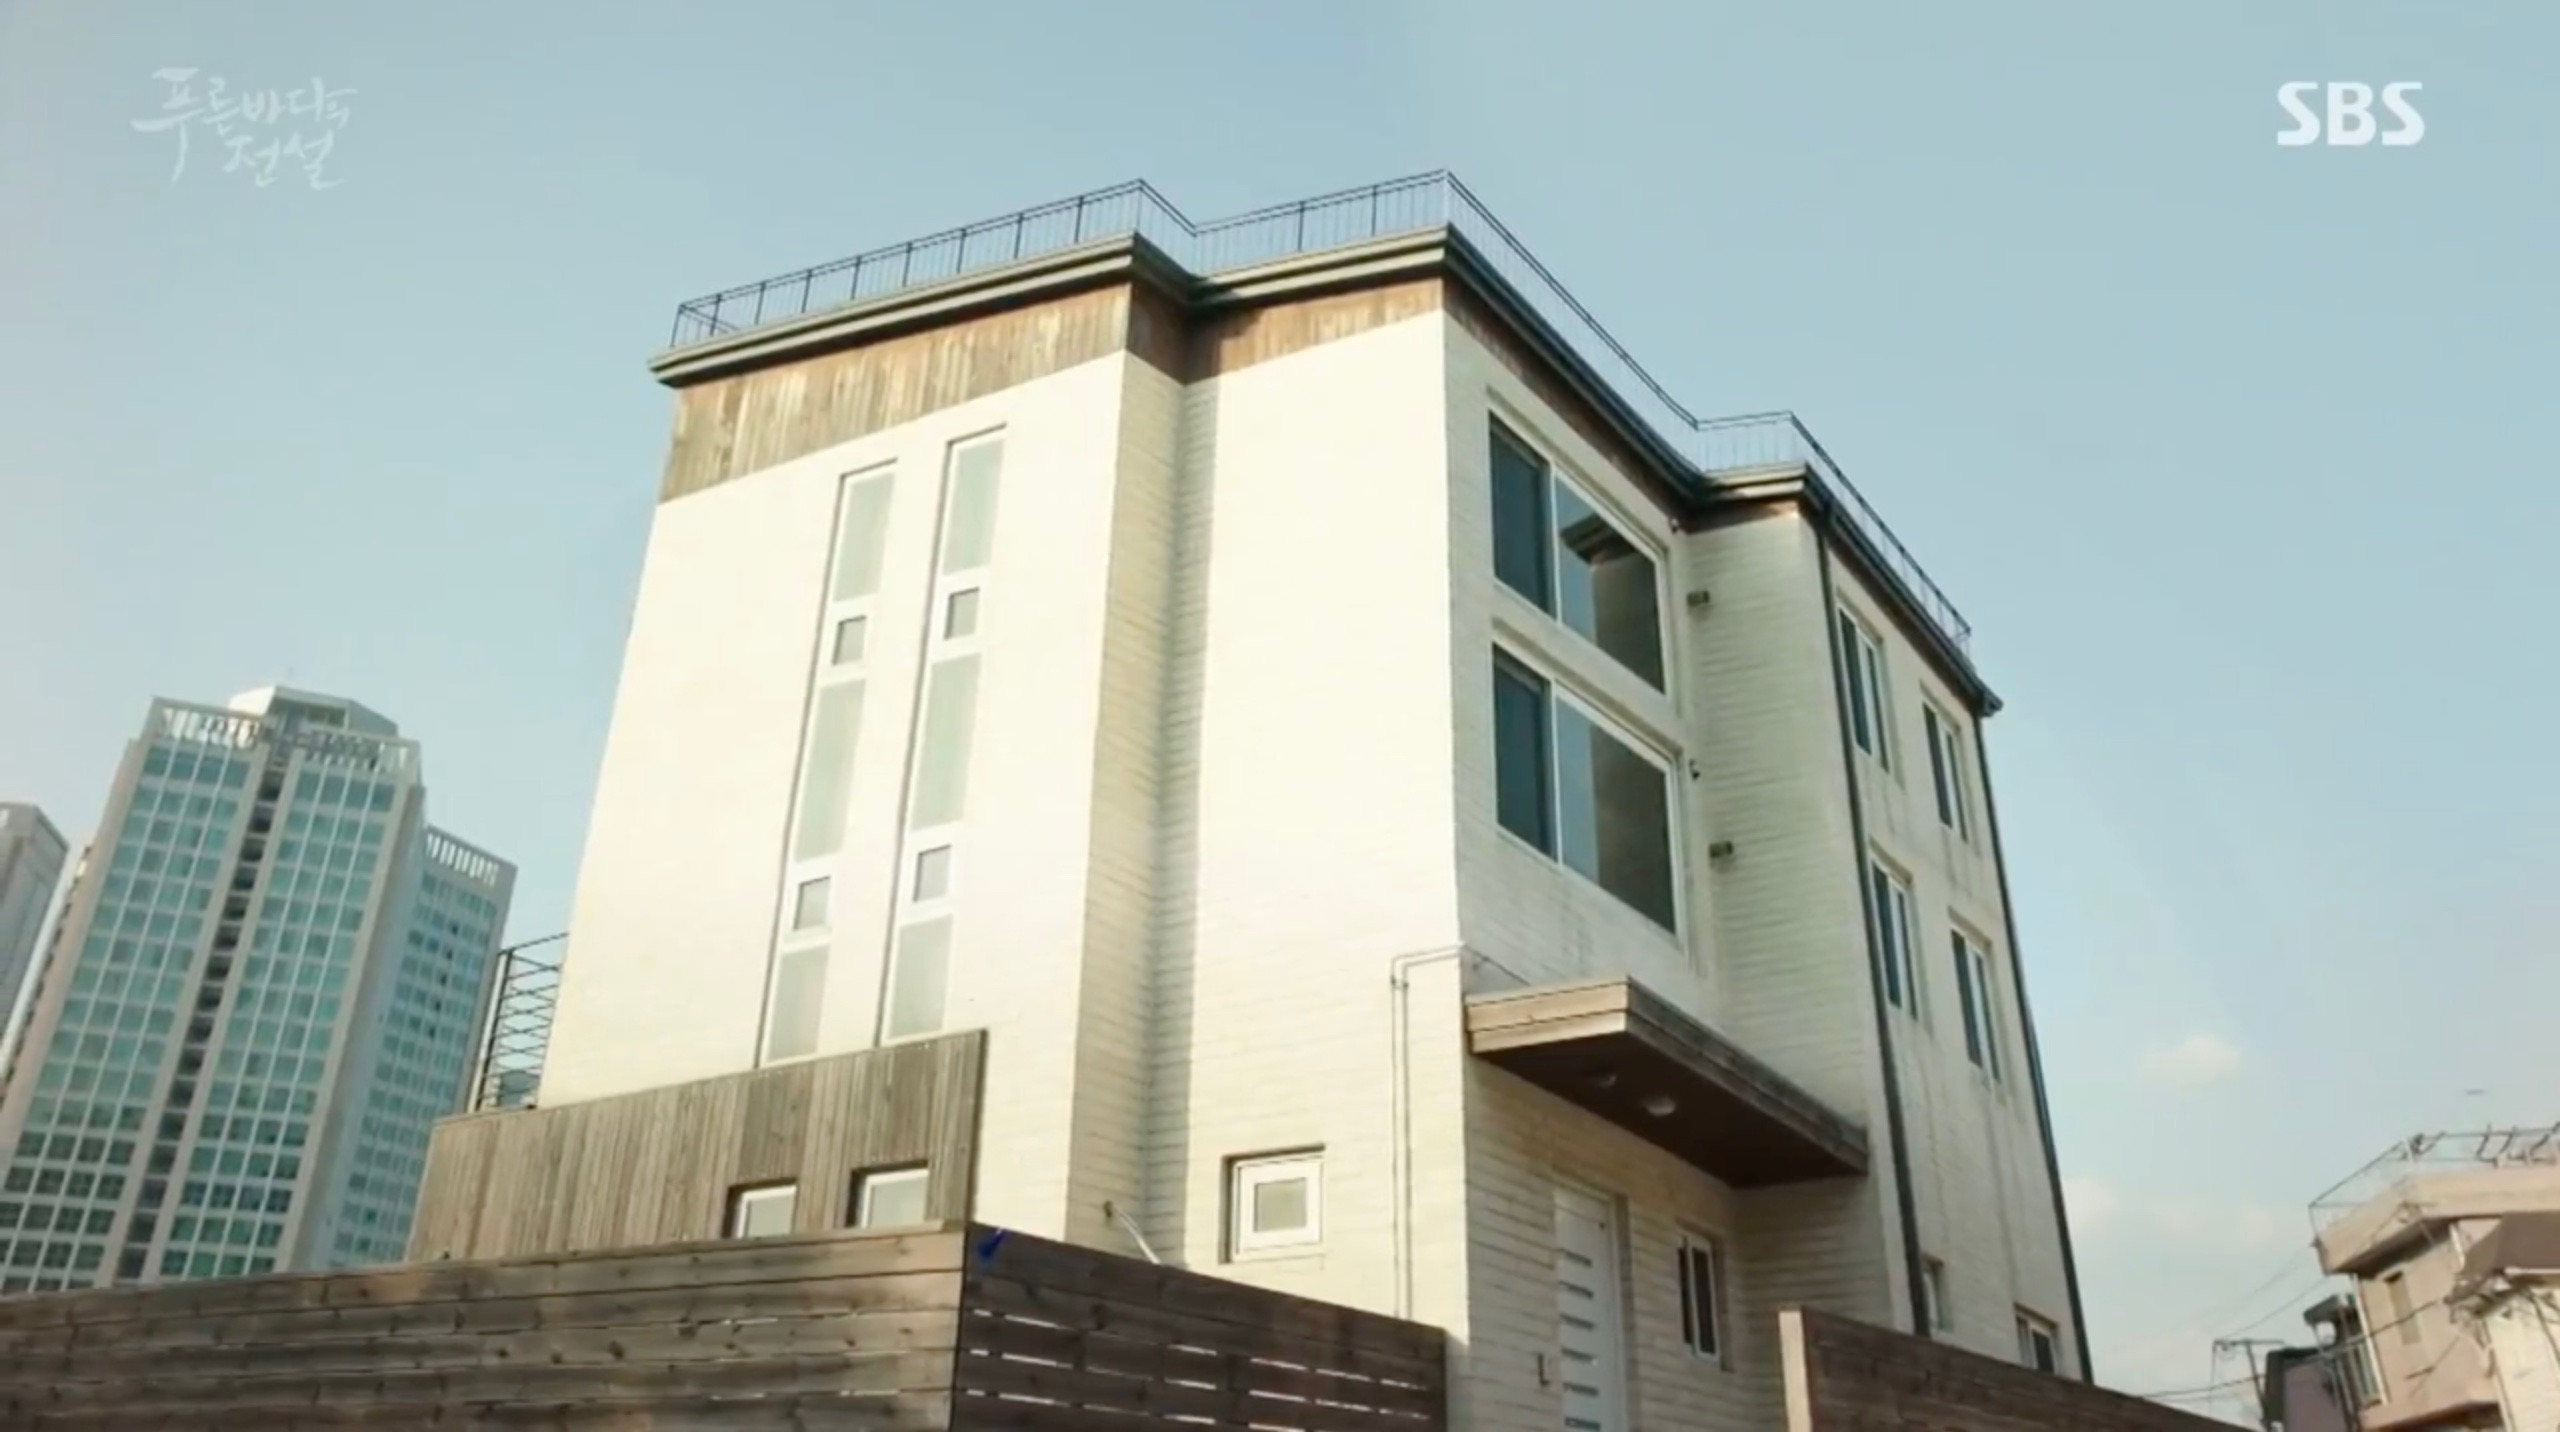 Denah Rumah Film Full House heo joon-jae\u0027s house [갤러리487] \u2014 exterior & Denah Rumah Film Full House - Denah Rumah